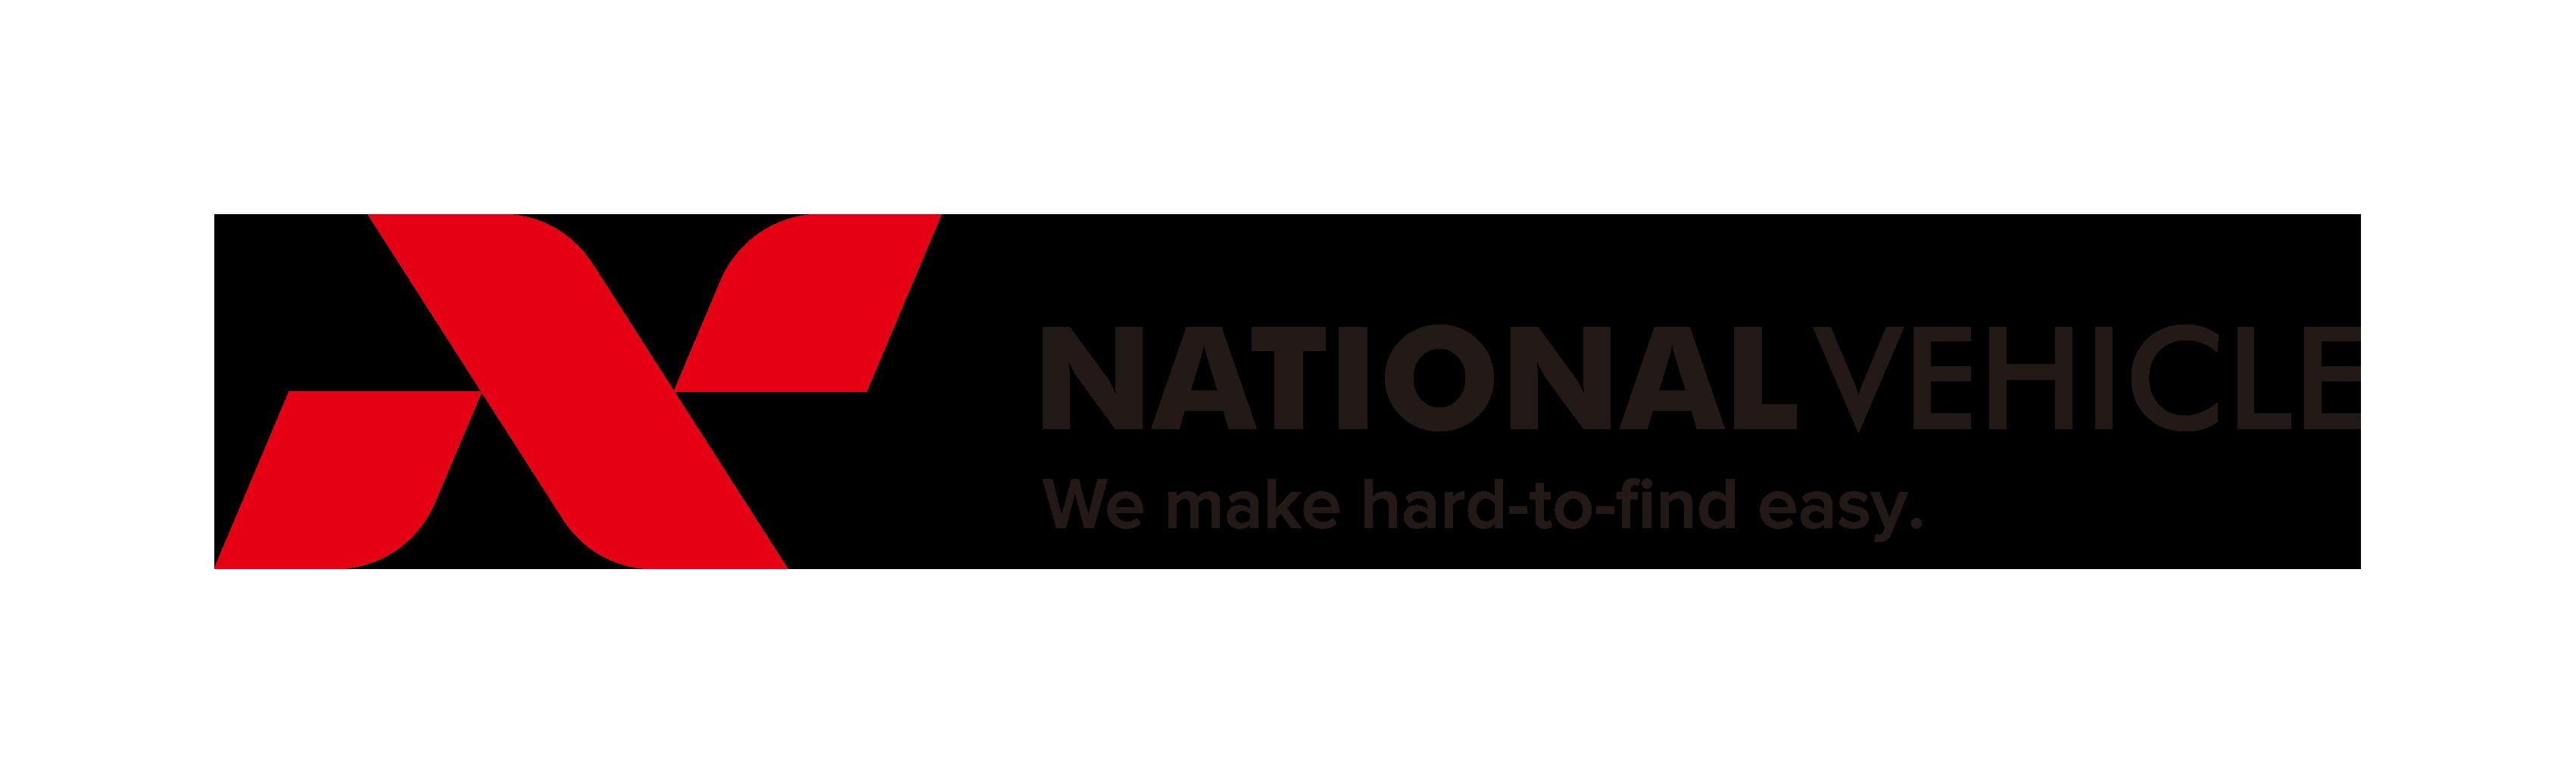 National Vehicle needs a fun & bold logo